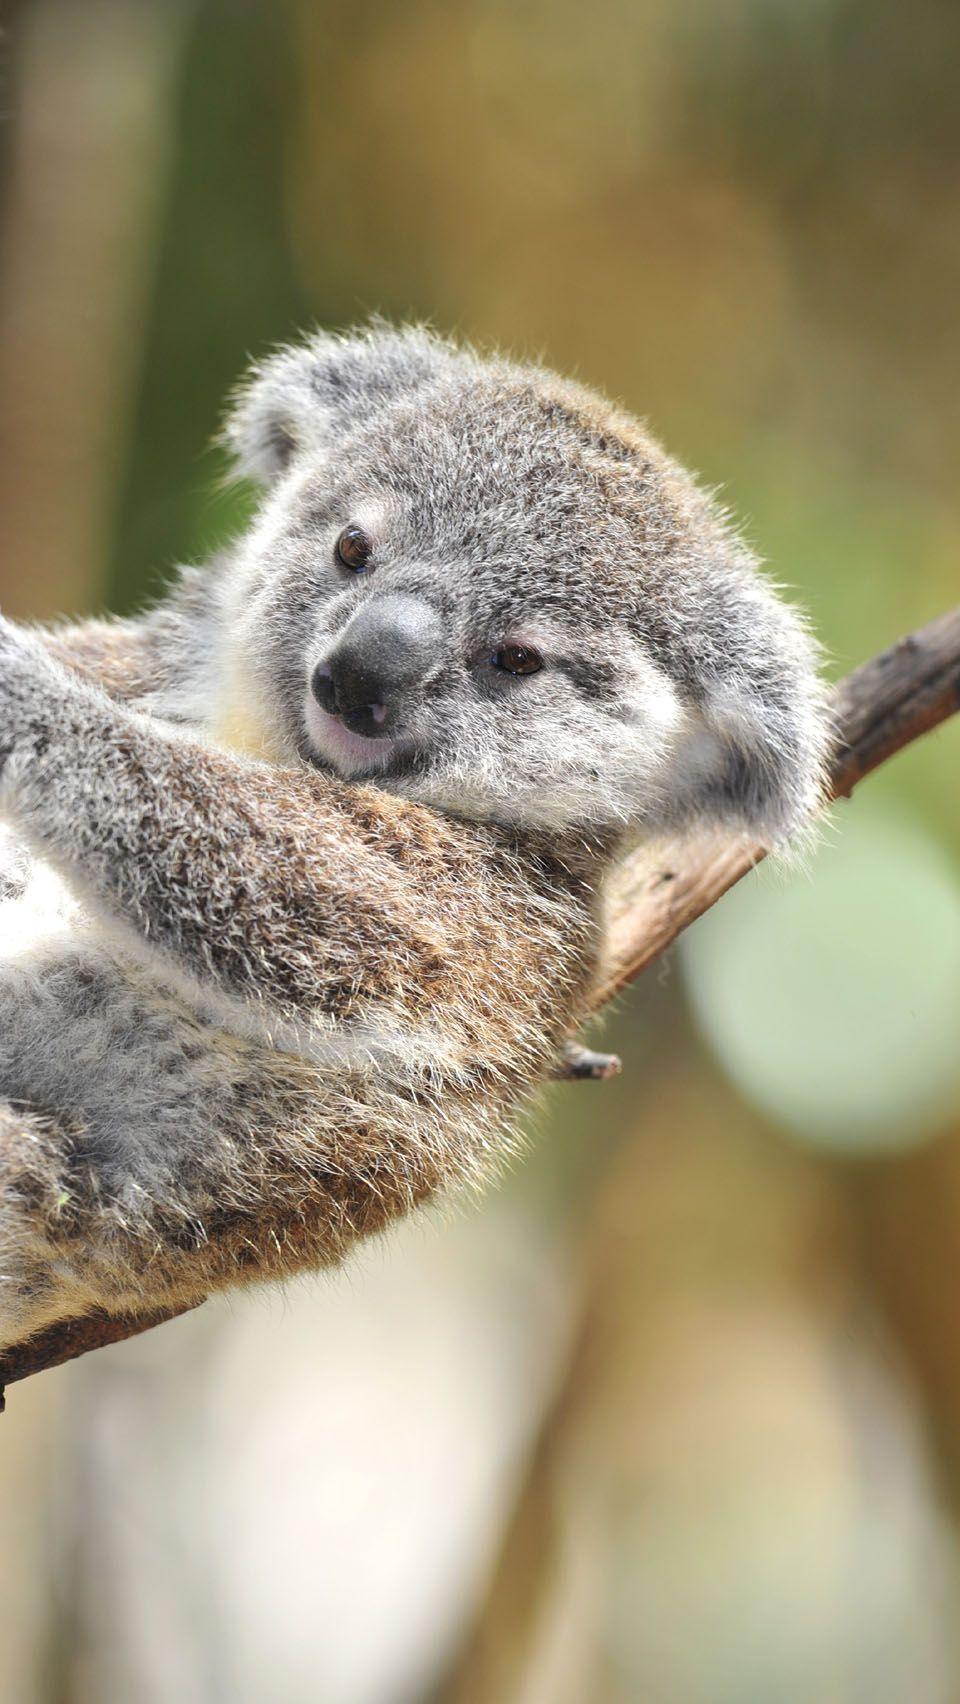 Baby Koala Wallpapers - Wallpaper Cave